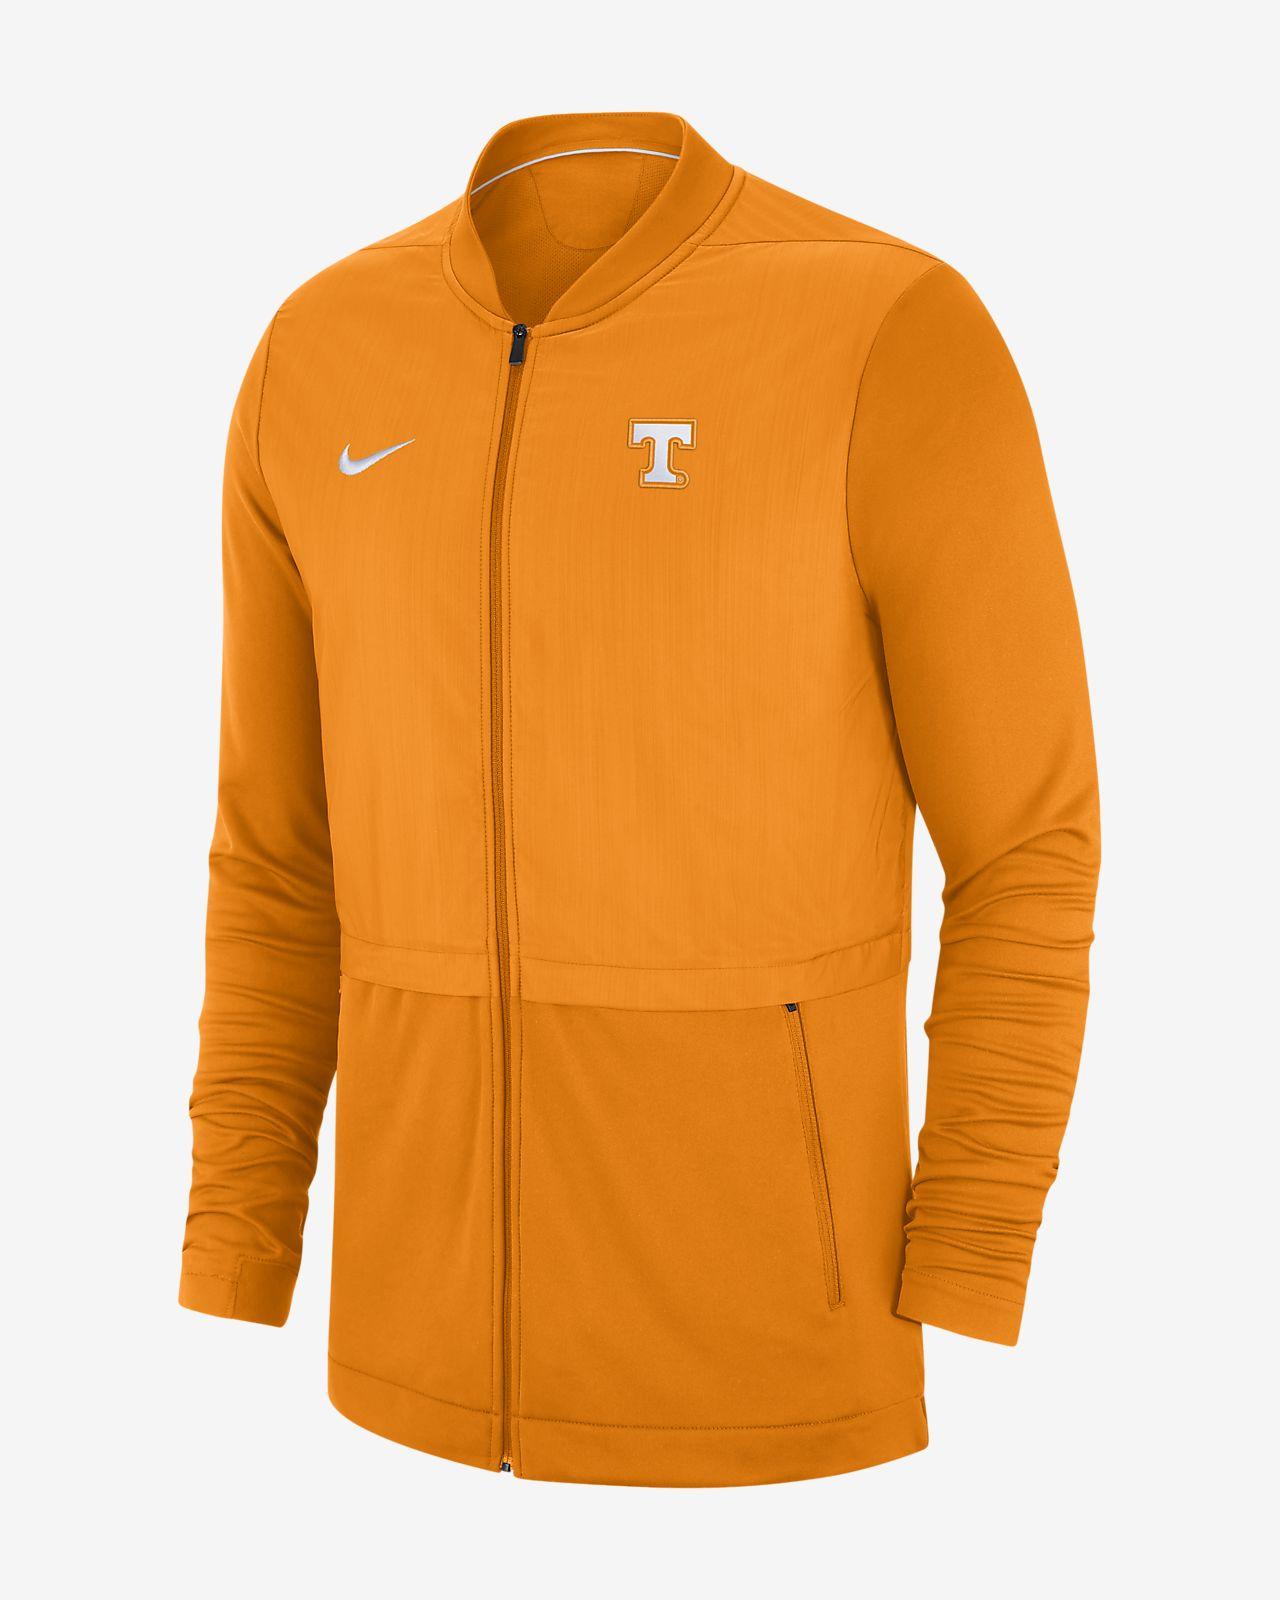 Nike College Dri-FIT Elite Hybrid (Tennessee) Men's Jacket